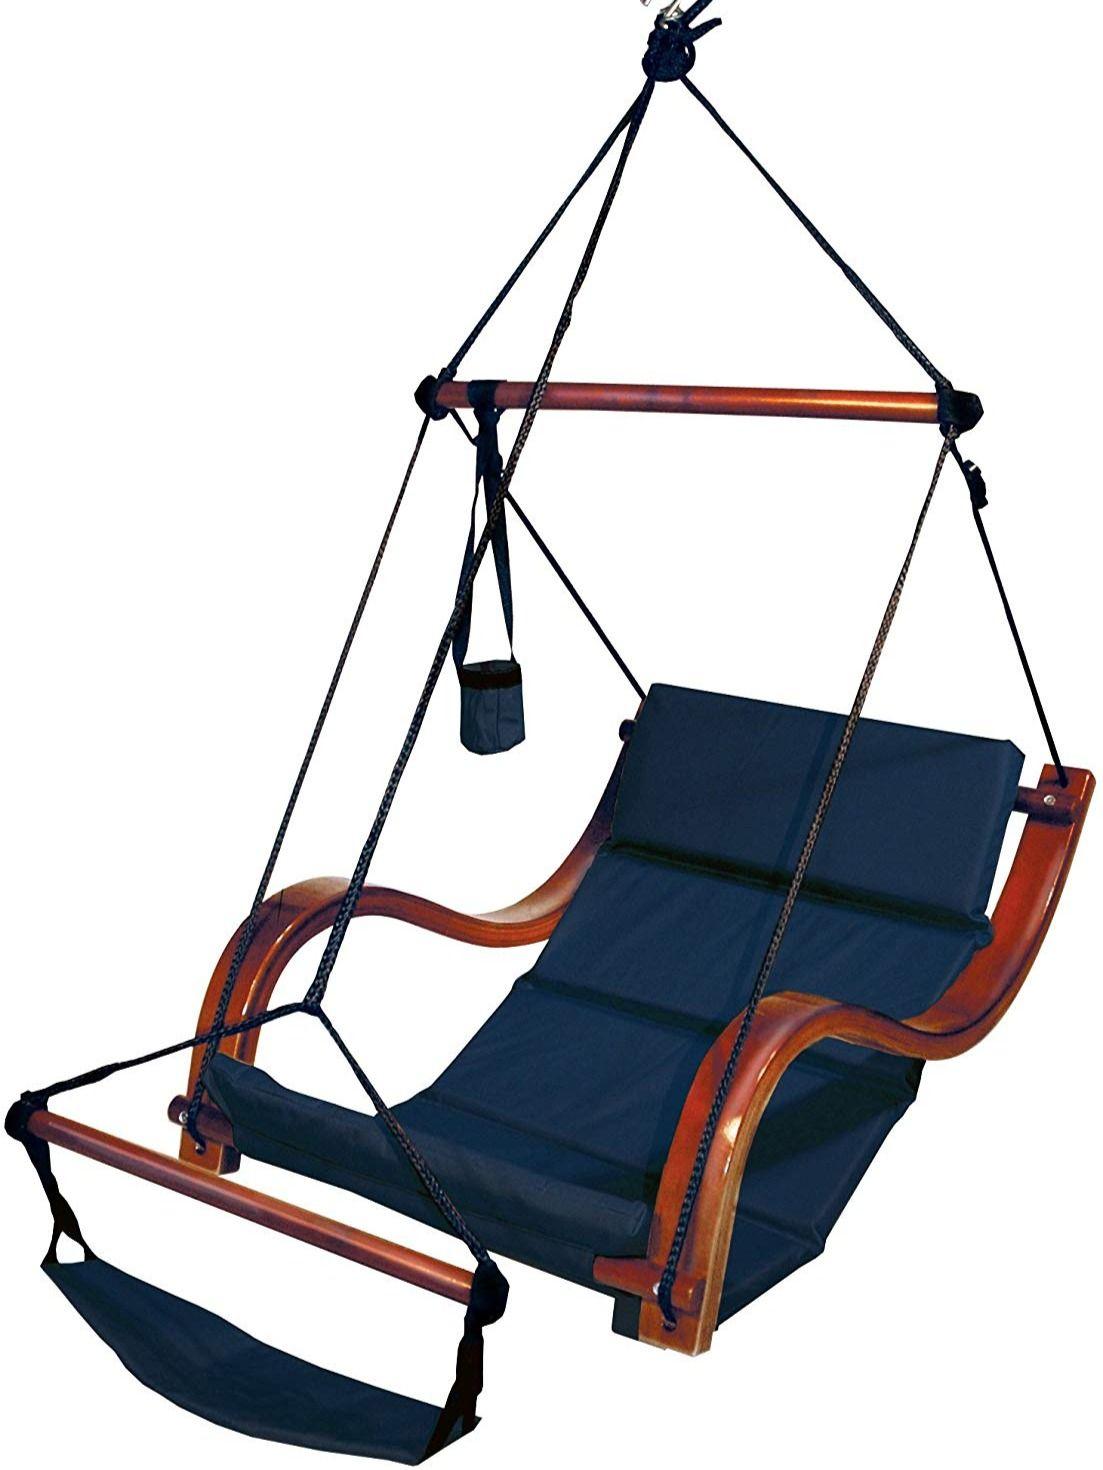 Hammaka nami deluxe hanging hammock lounger chair 5